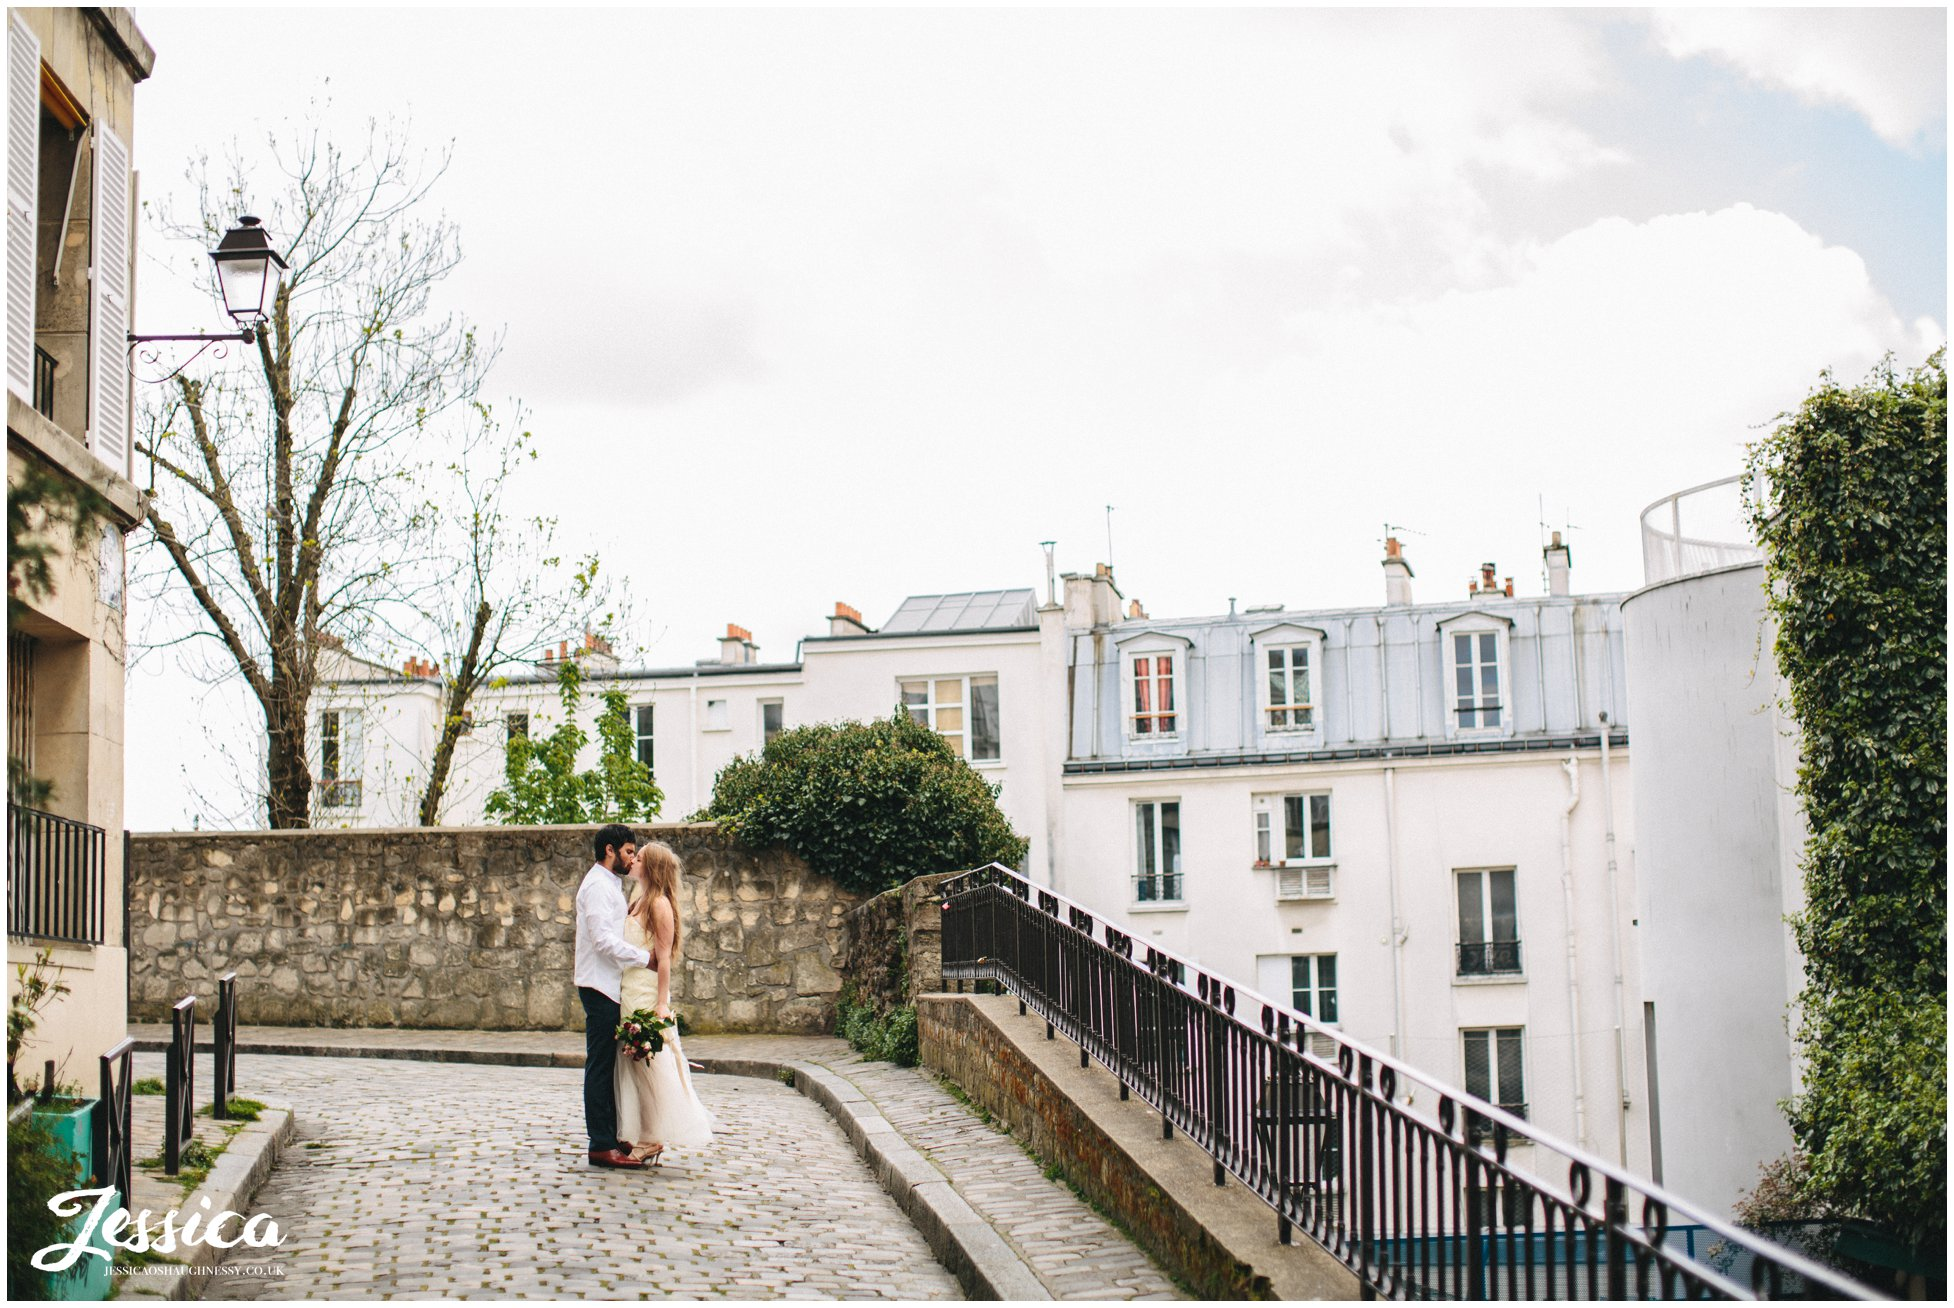 newly weds kiss on parisian street - france wedding photographer